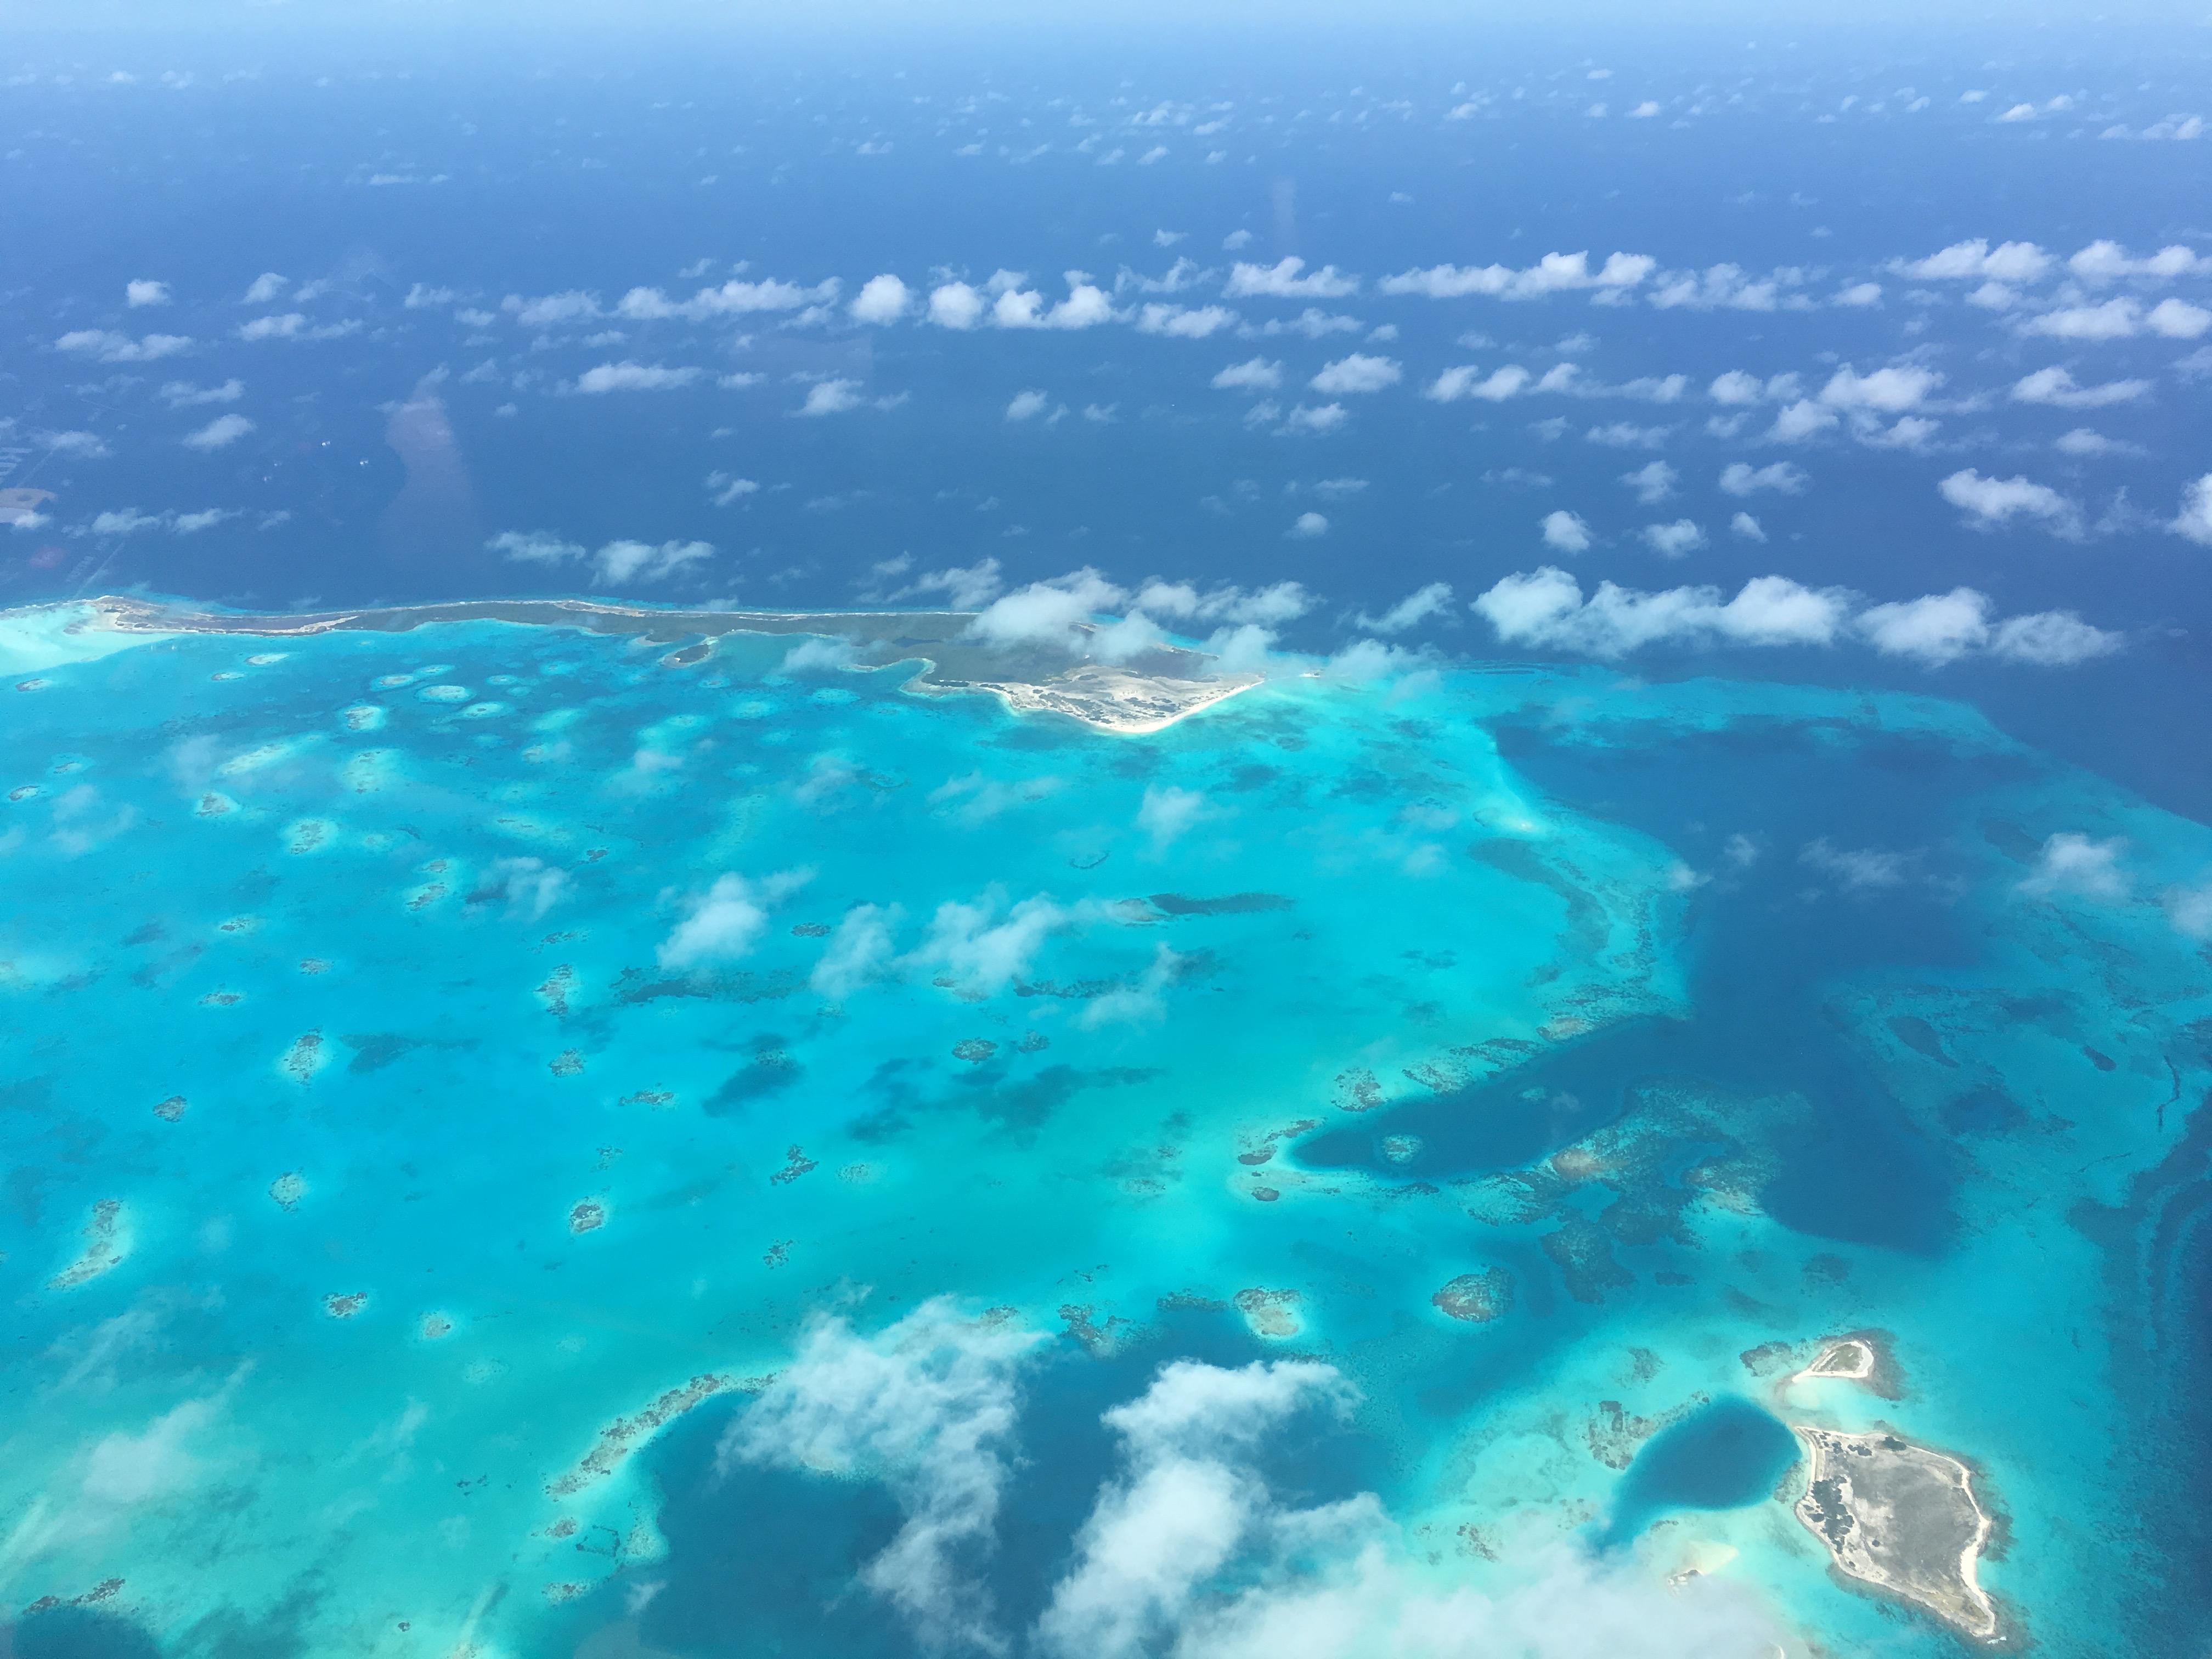 063 IMG_2808 Islas Las Aves - Carribean Sea